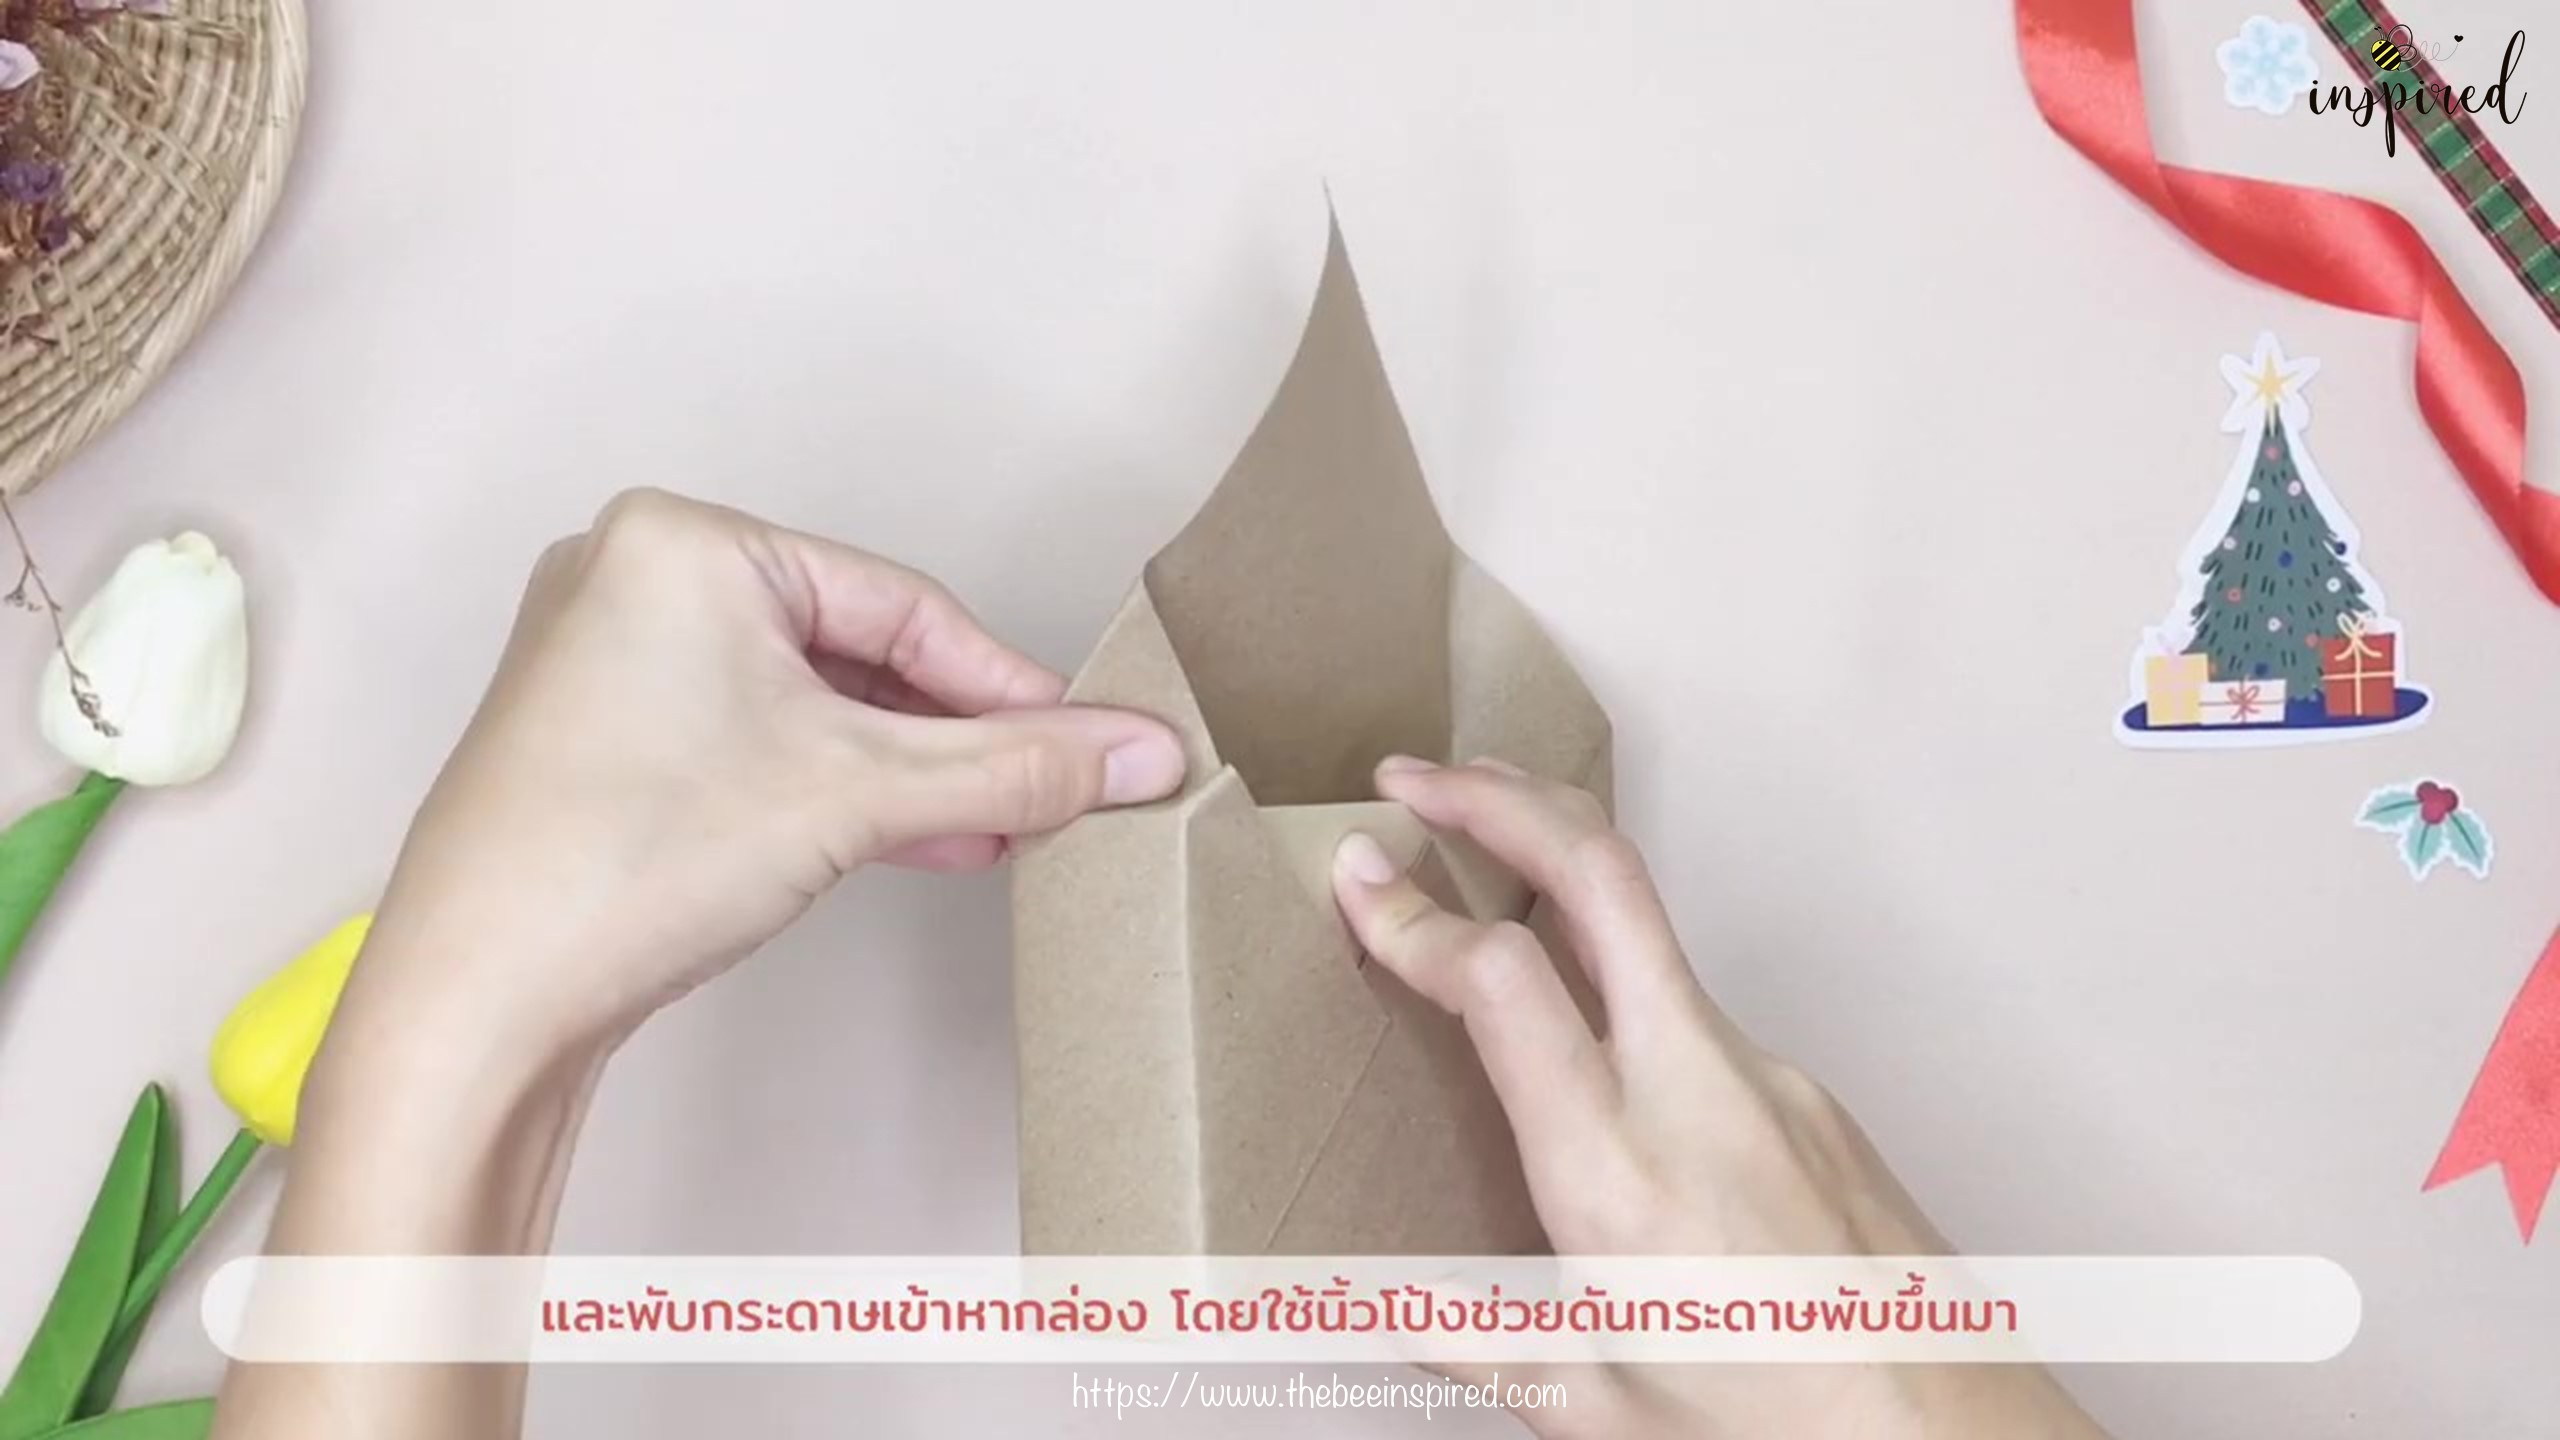 DIY วิธีห่อของขวัญวันวาเลนไทน์ วันปีใหม่ วันคริสมาส & วันเกิด แบบประหยัดกระดาษ_ Gift Wrapping Hack_12